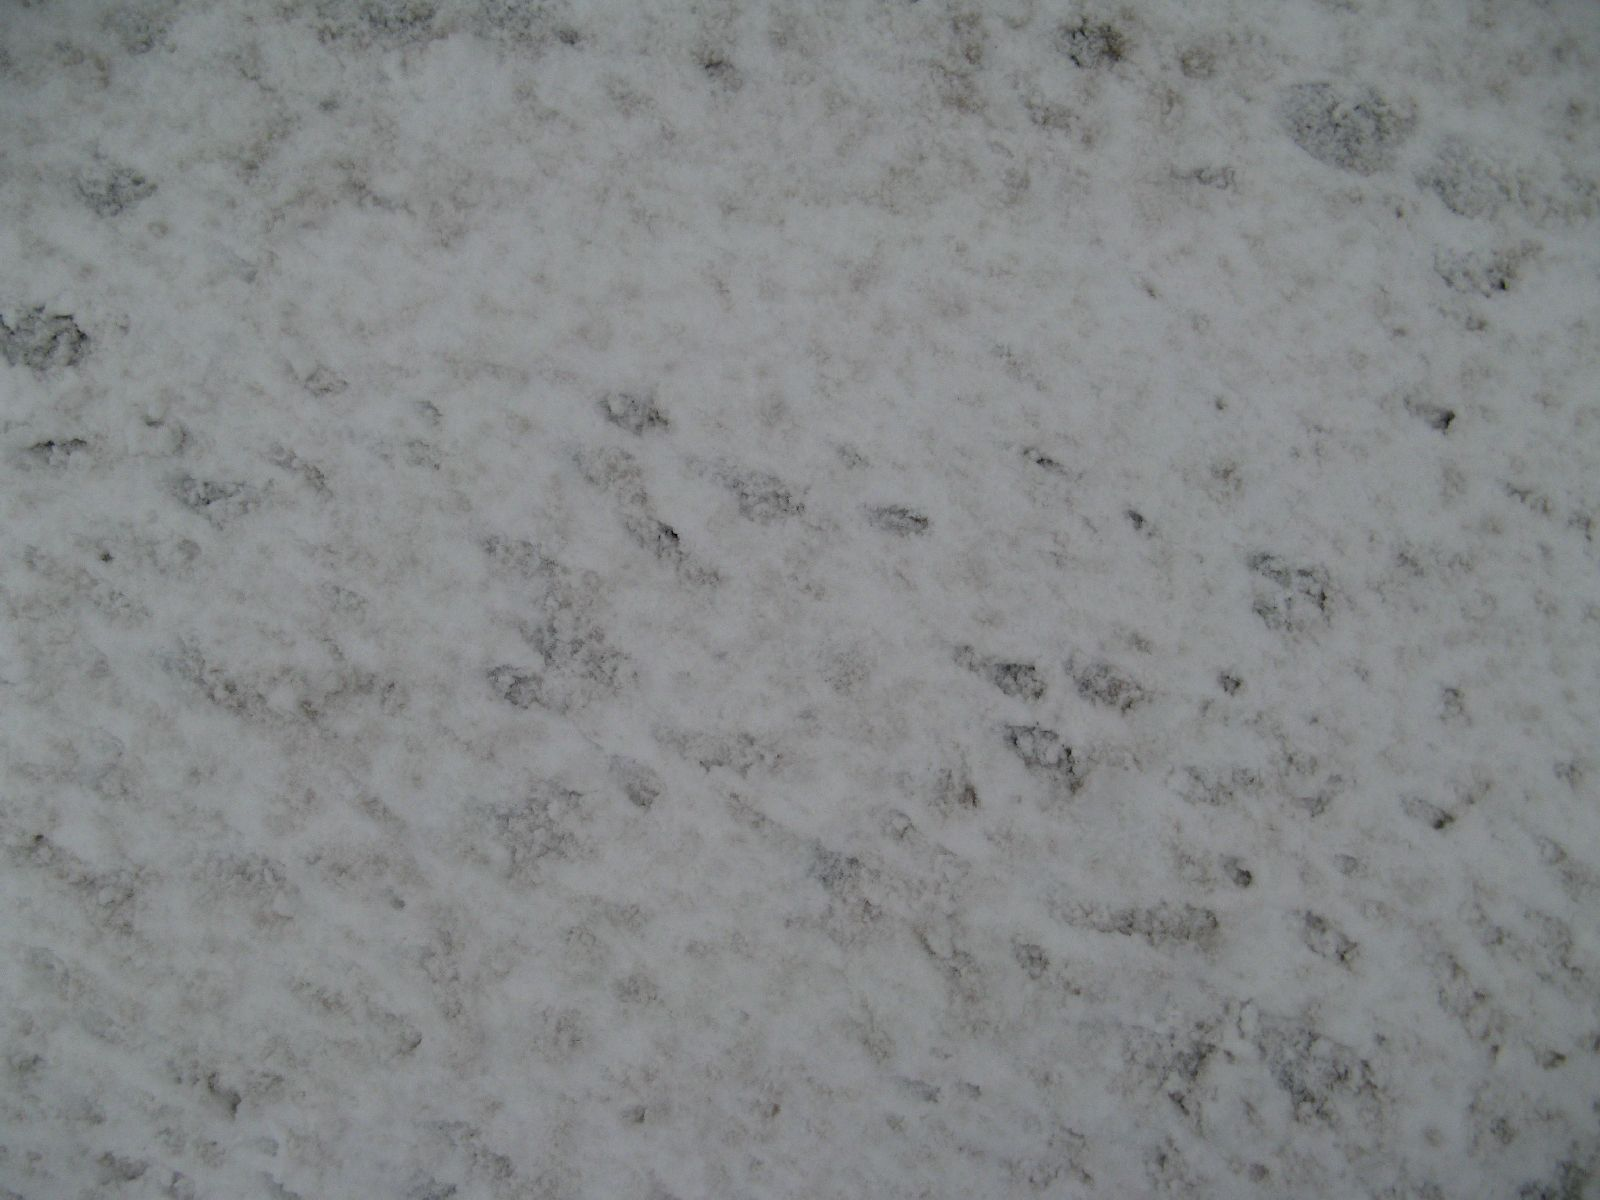 Schnee-Eis_Textur_B_5890